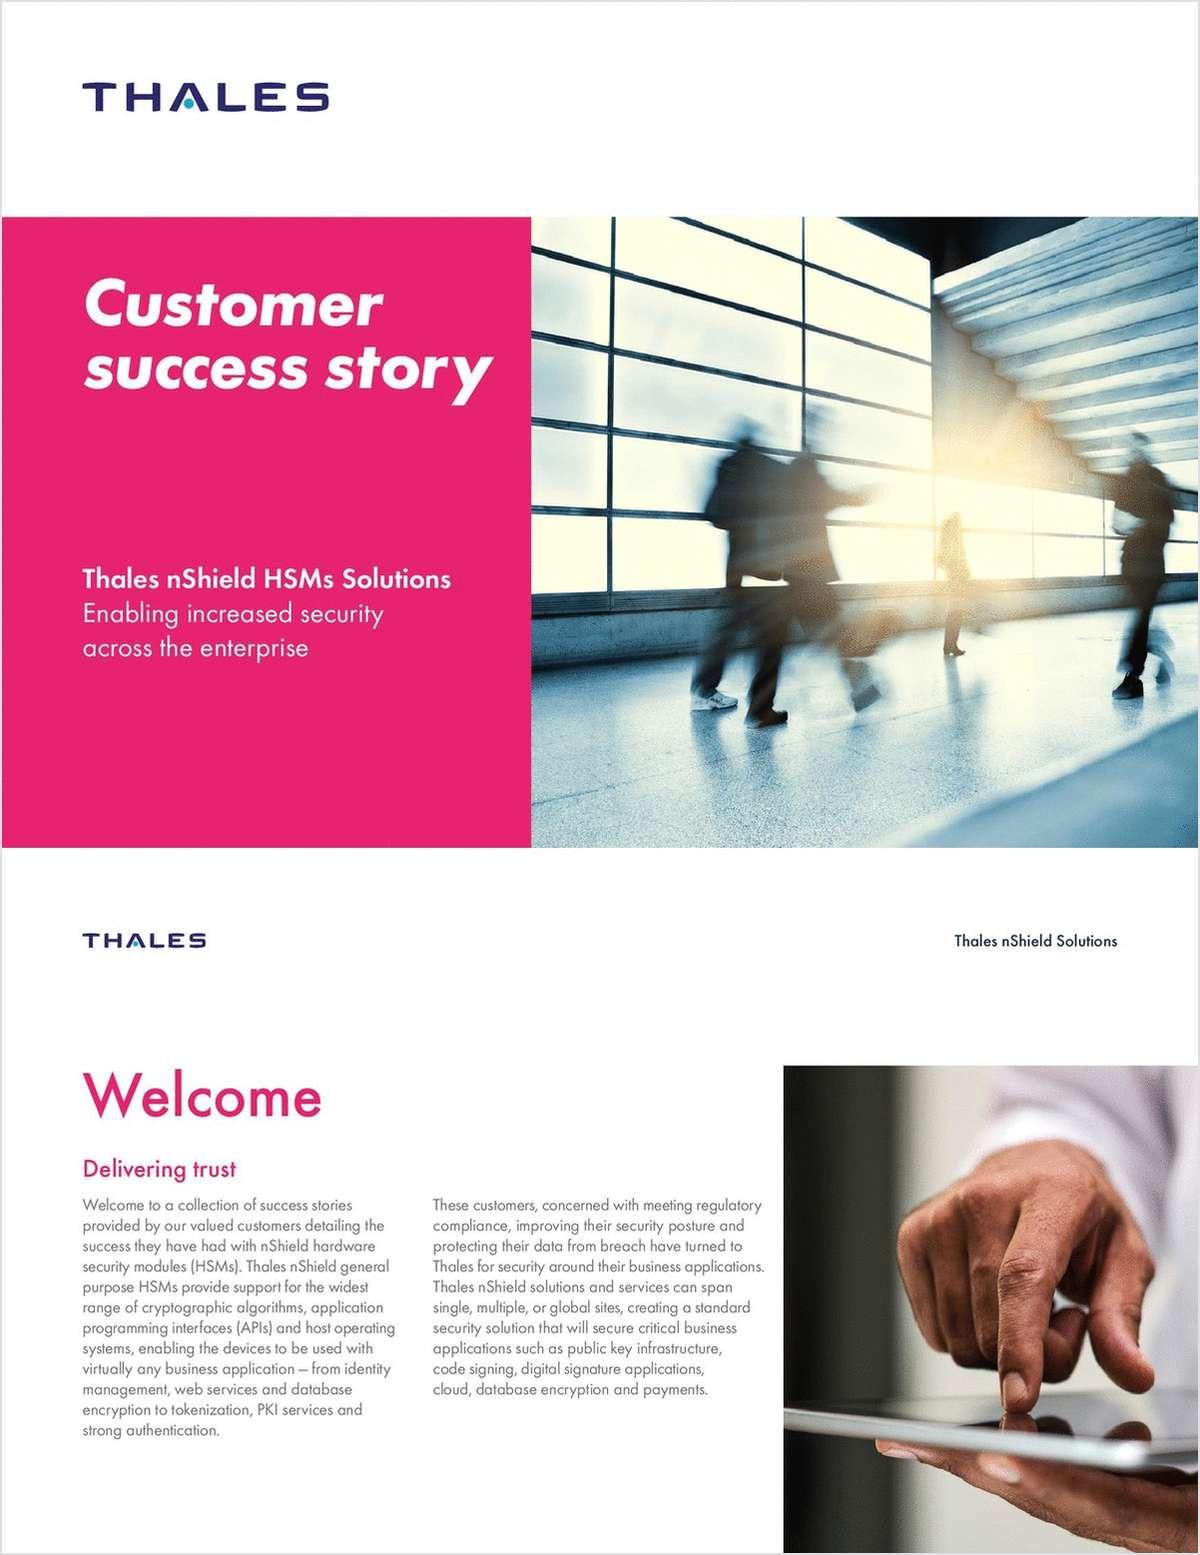 Security Across the Enterprise - Customer Success Stories